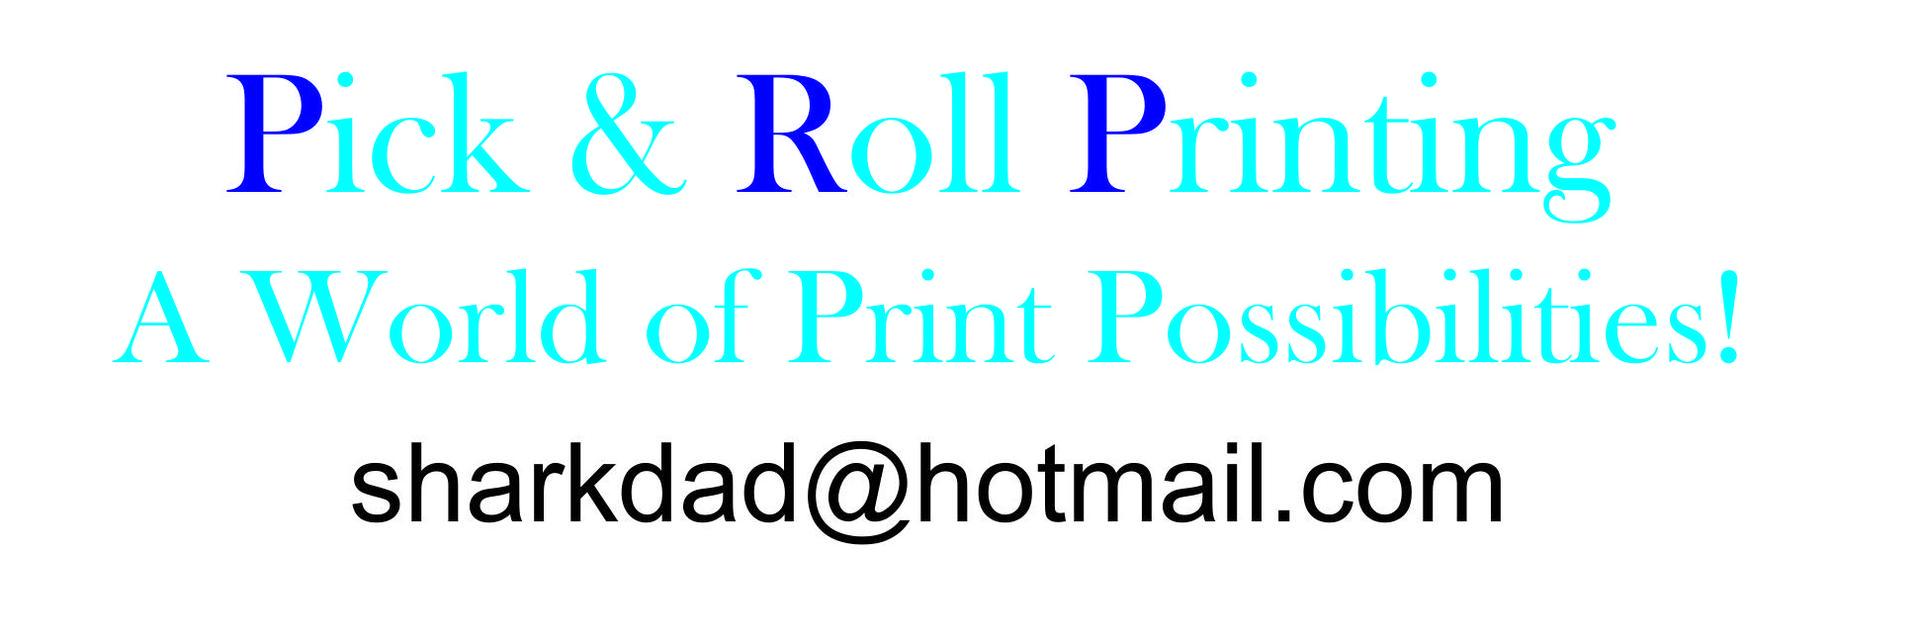 Pick & Roll Printing